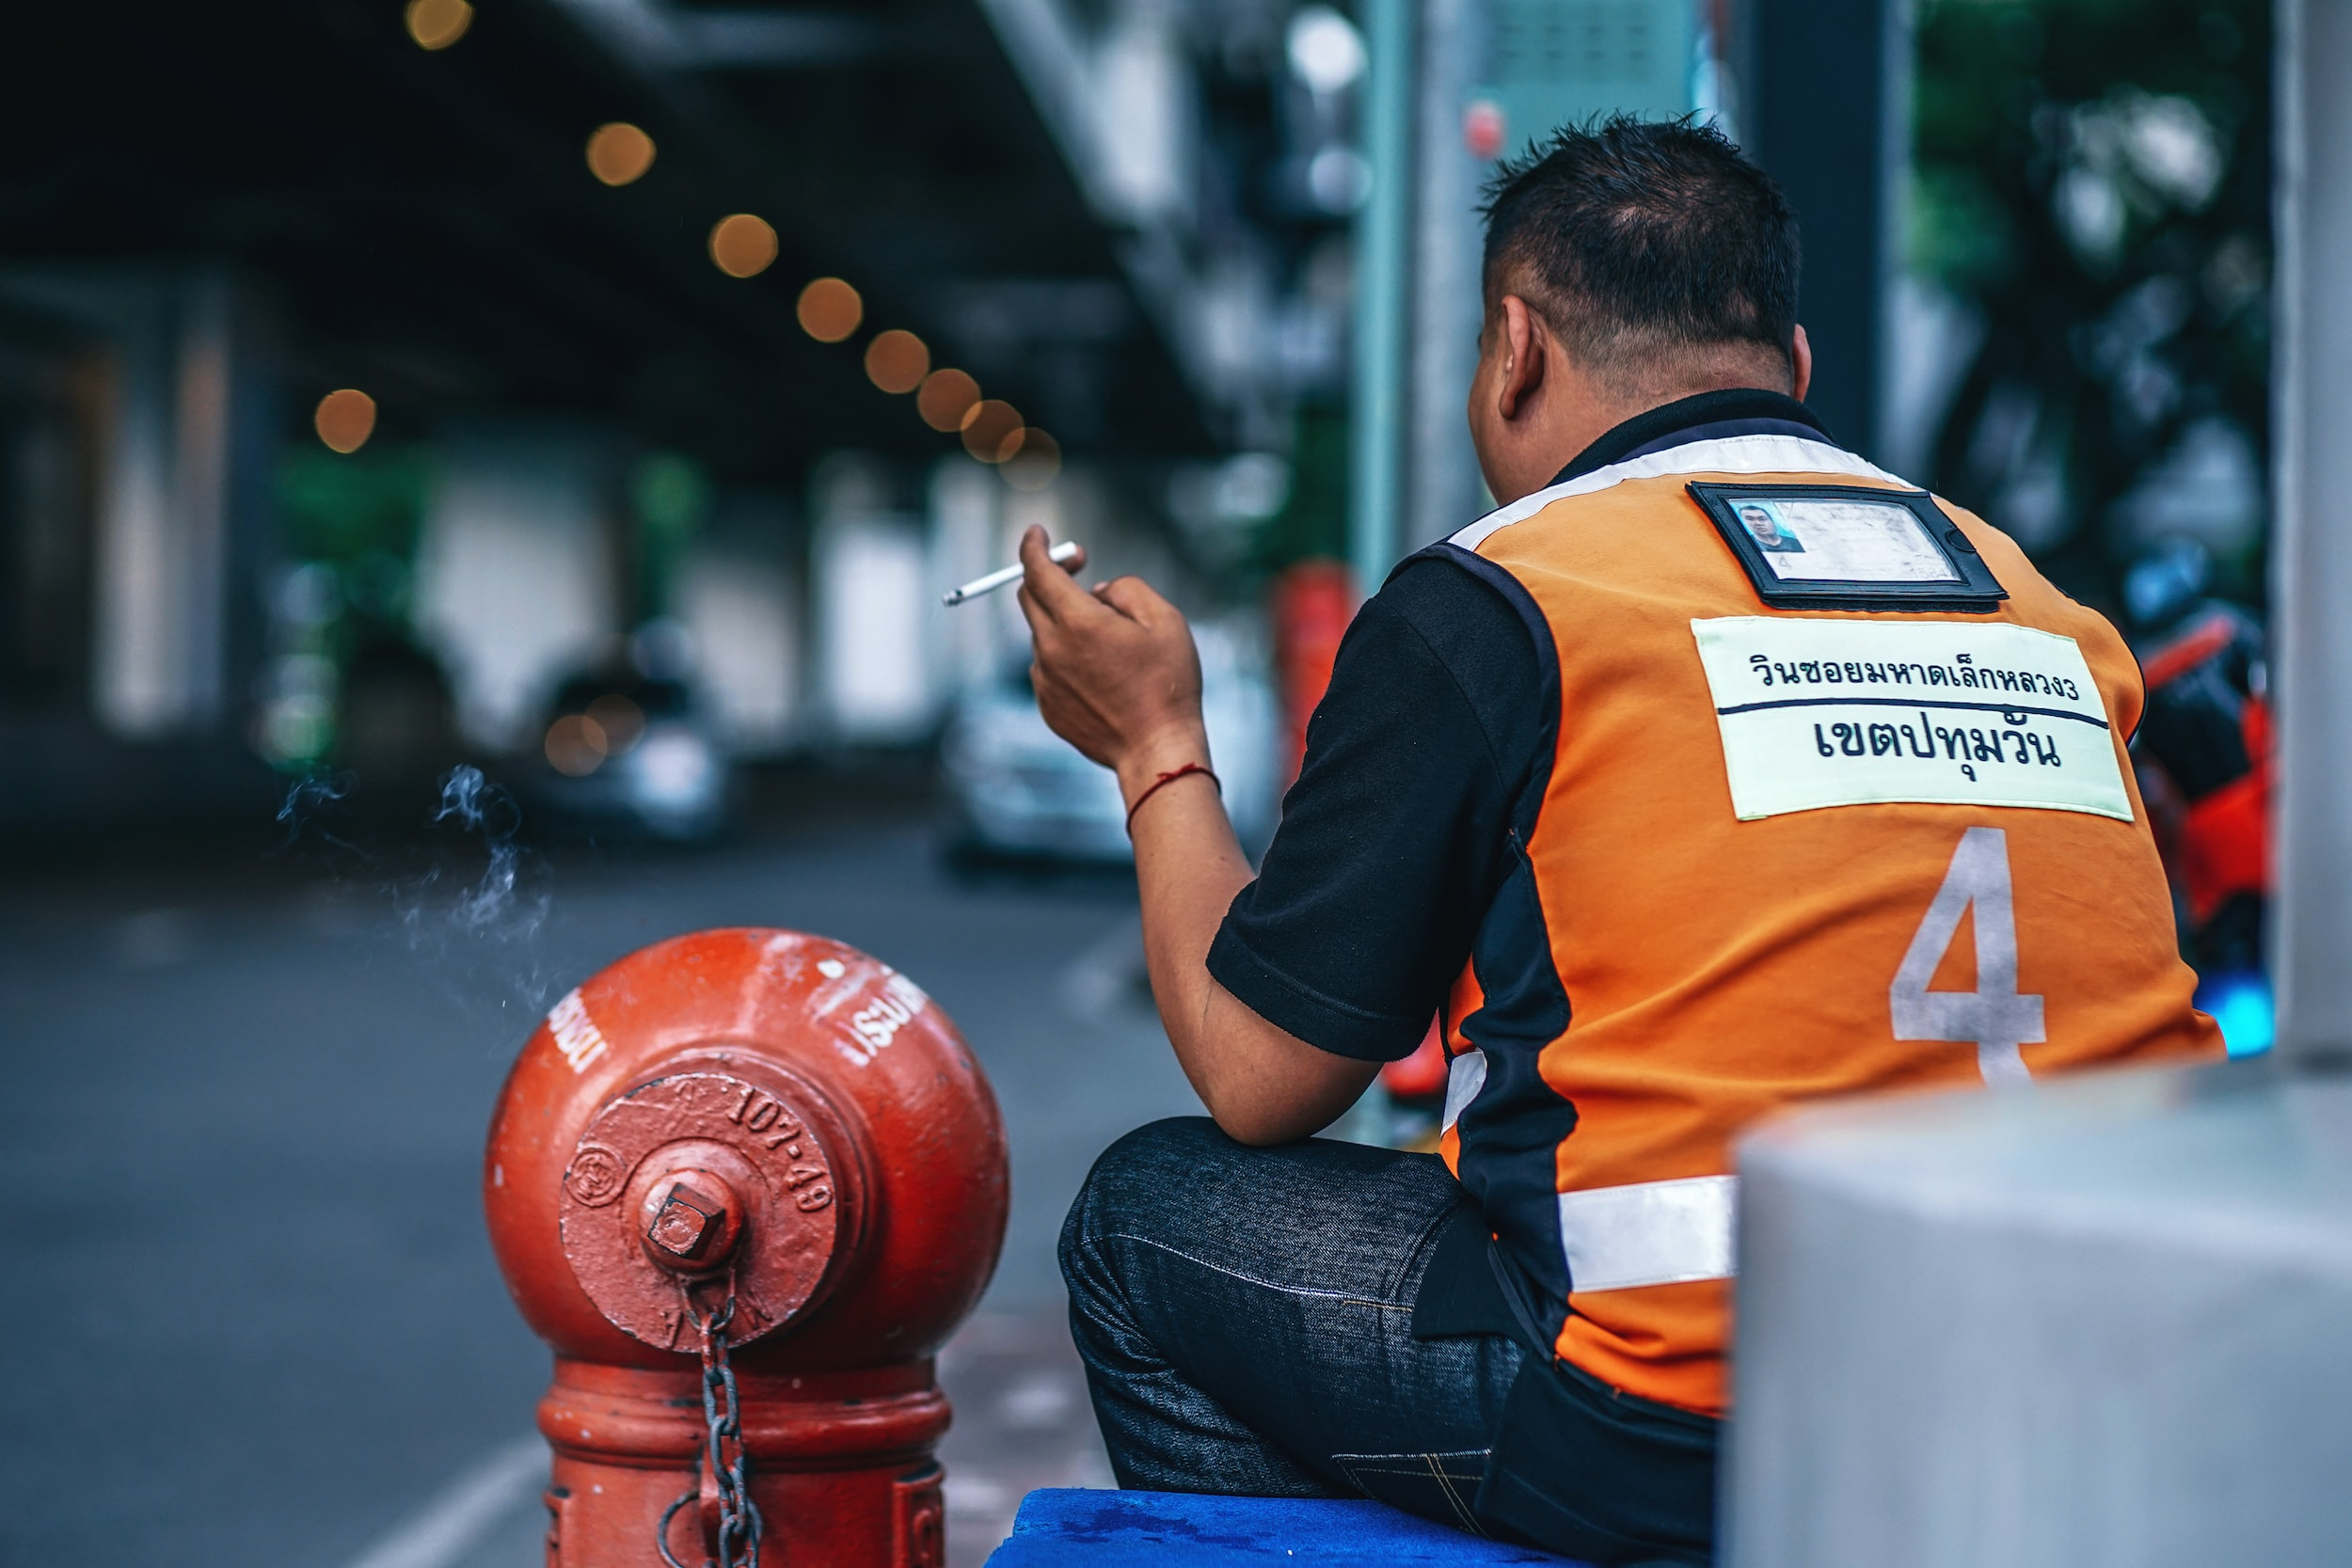 man smoking beside fire hydrant